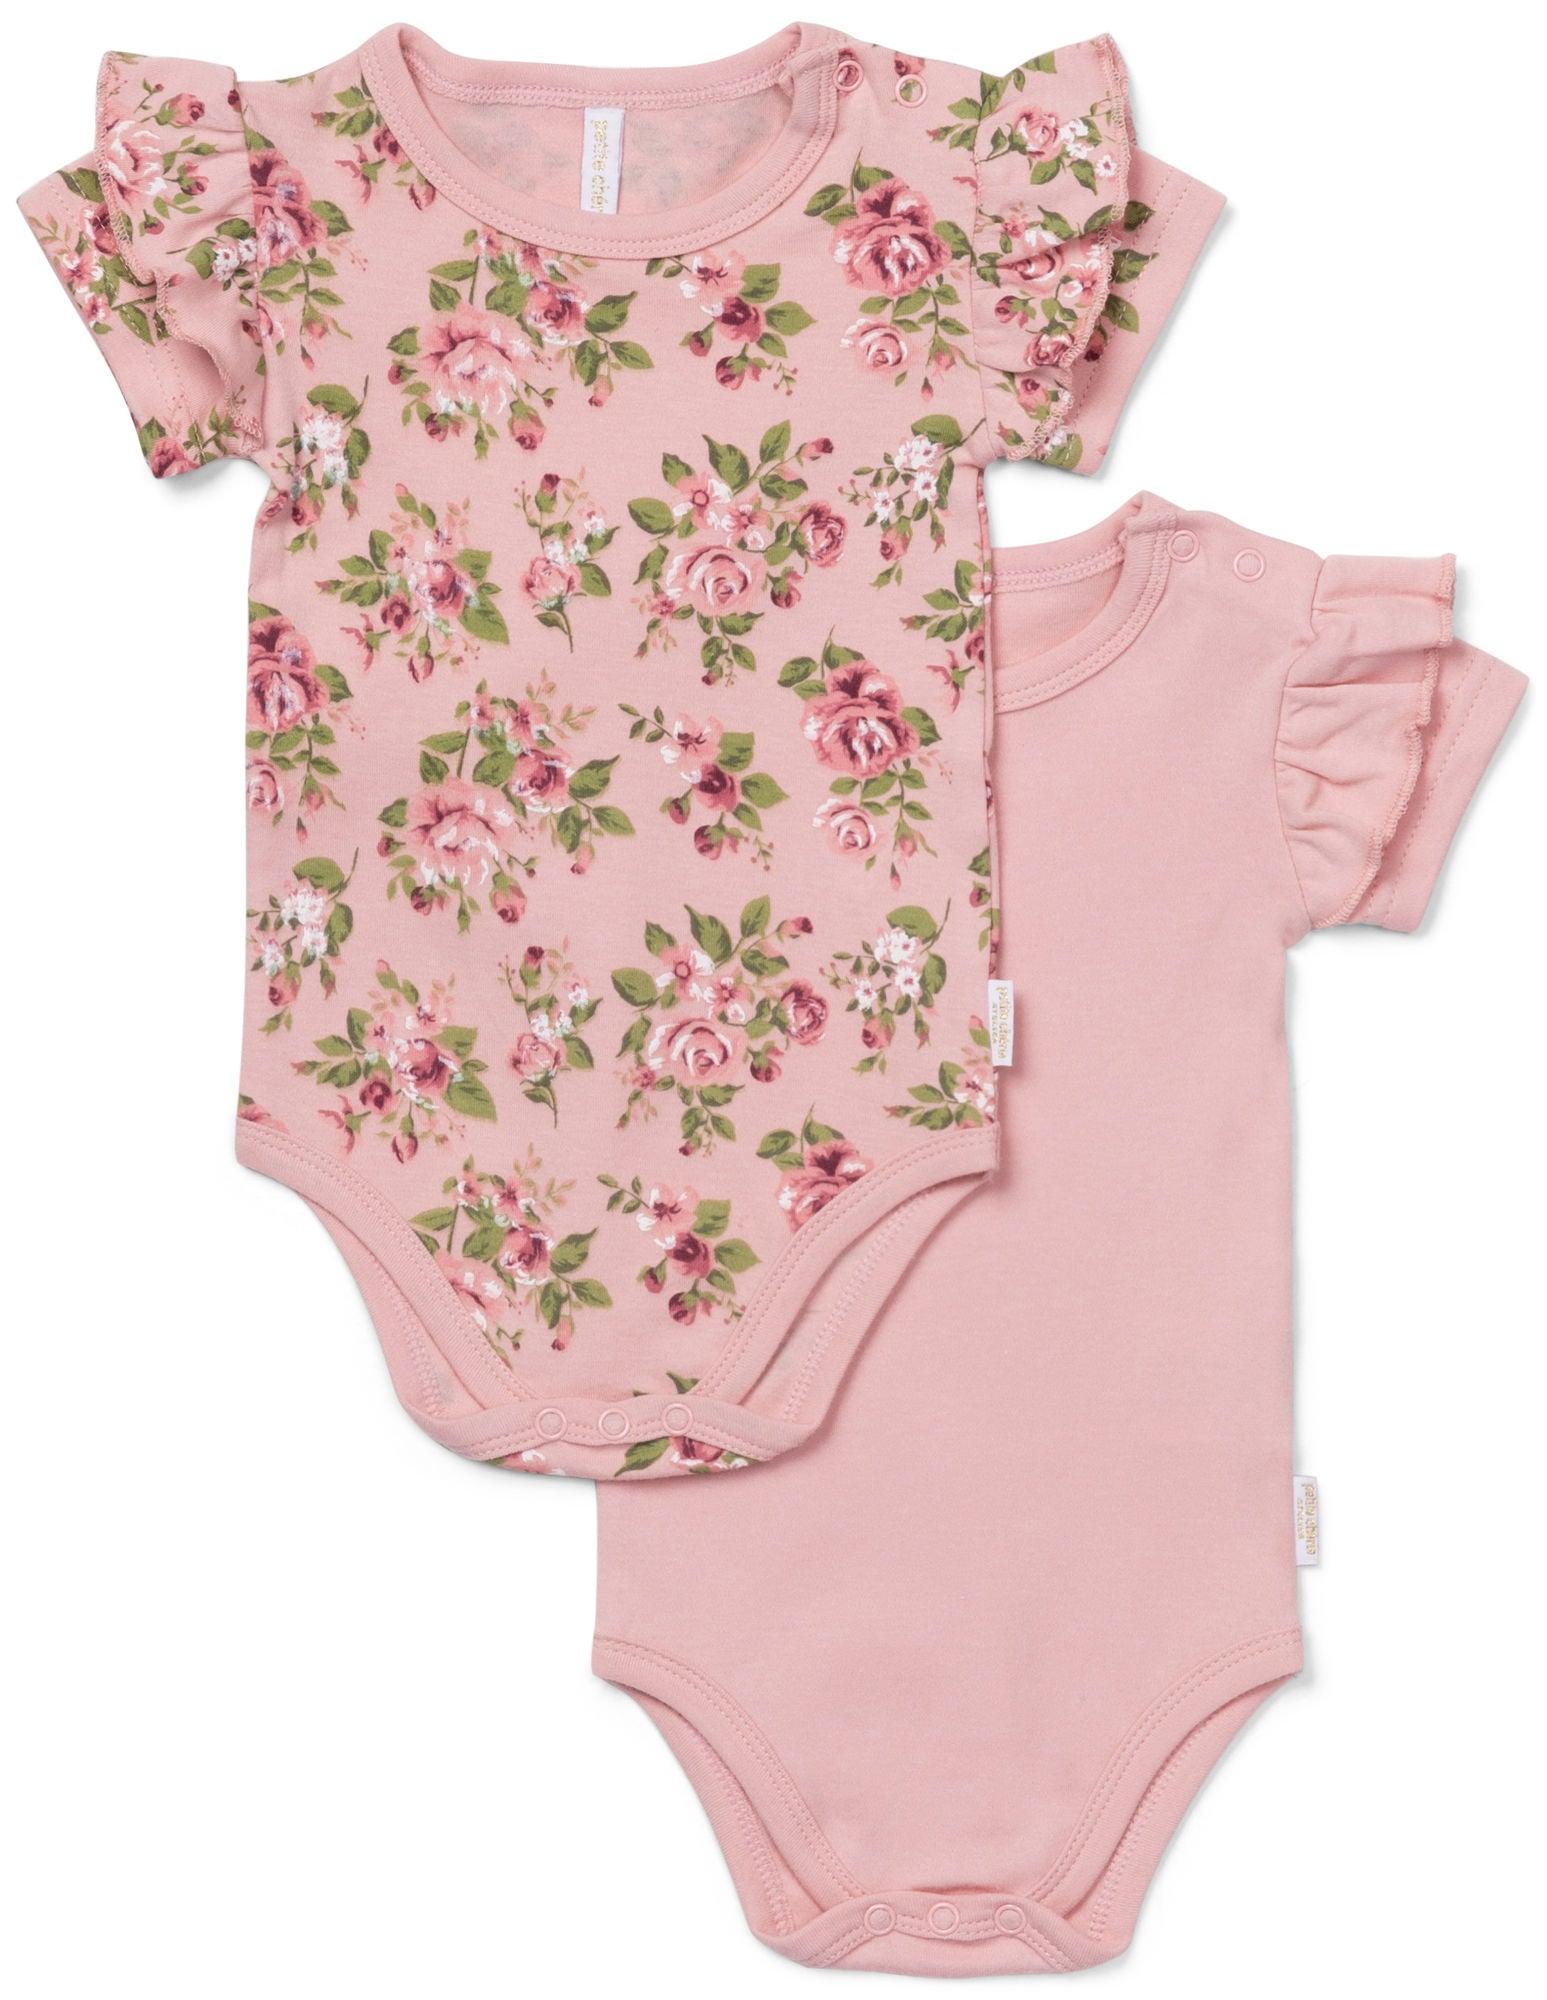 1be7b94b Petite Chérie Atelier Catrin Body 2-Pack, Pink/Flowers